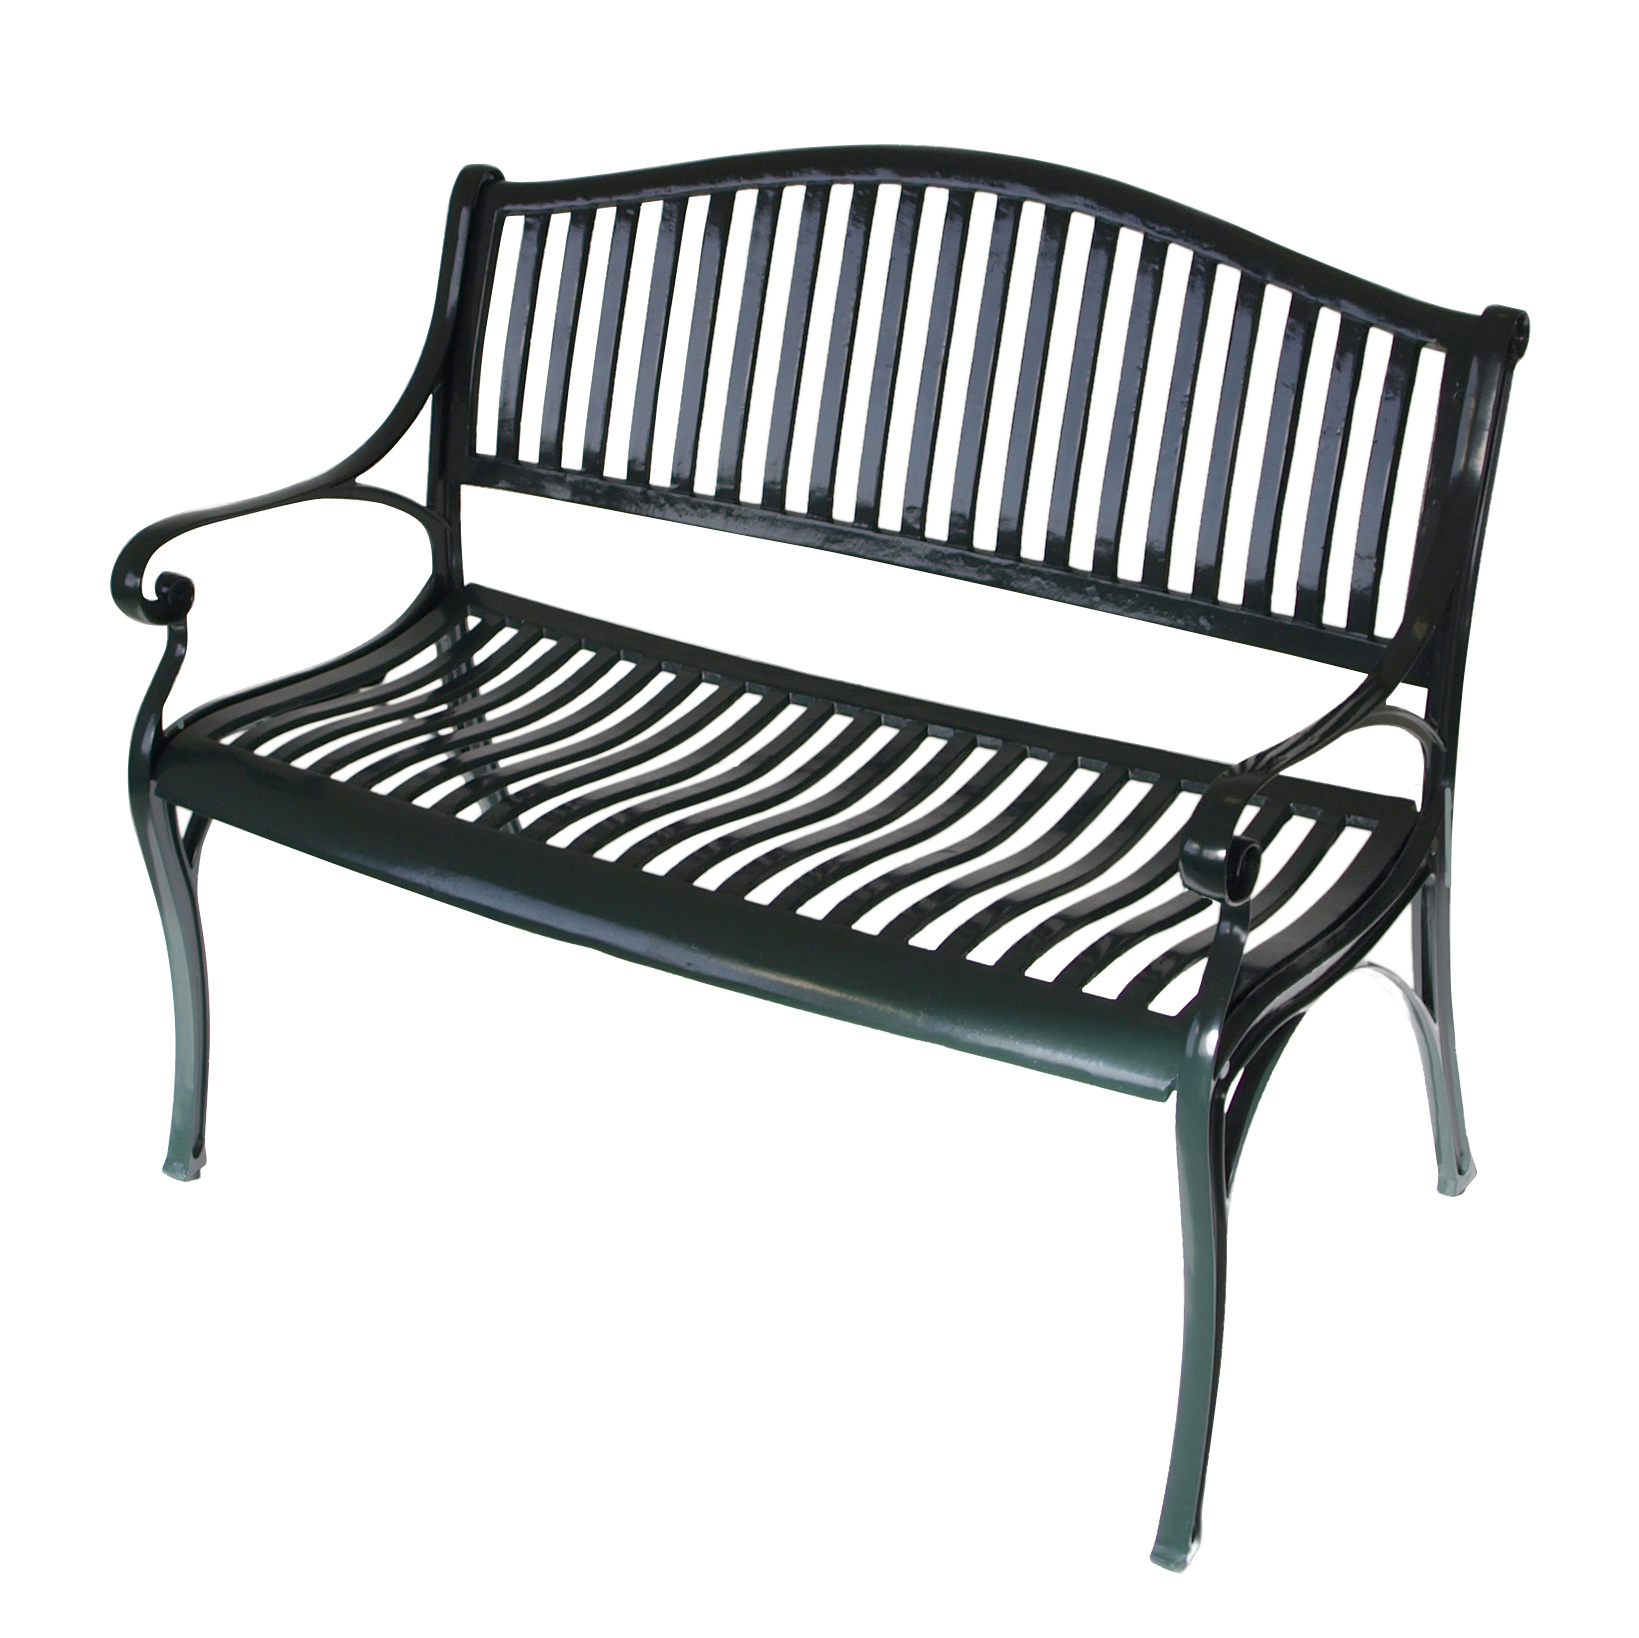 gartenbank napoli 2 sitzer aus wetterfestem aluminium aluguss dunkelgr n ebay. Black Bedroom Furniture Sets. Home Design Ideas